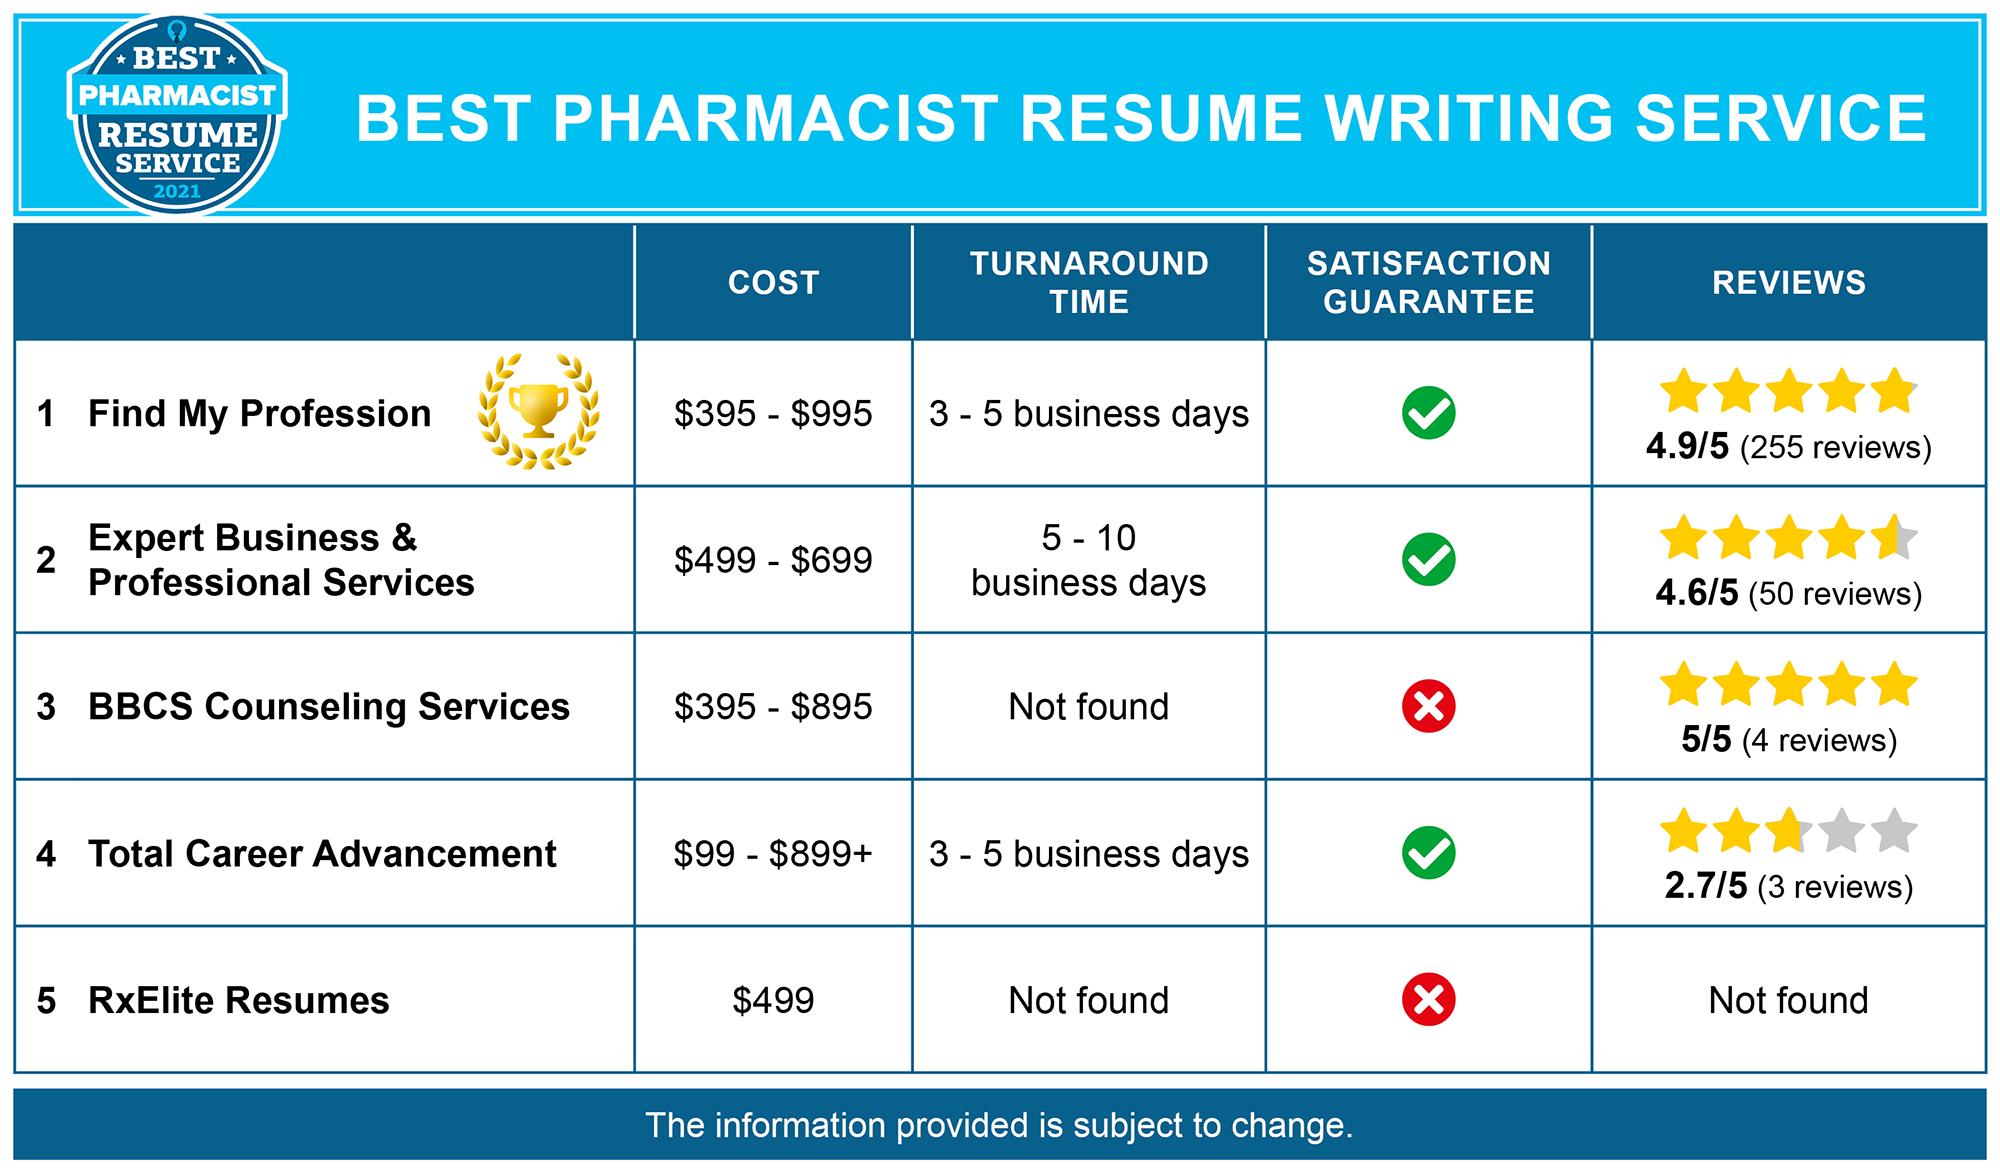 Best Pharmacist Resume Services